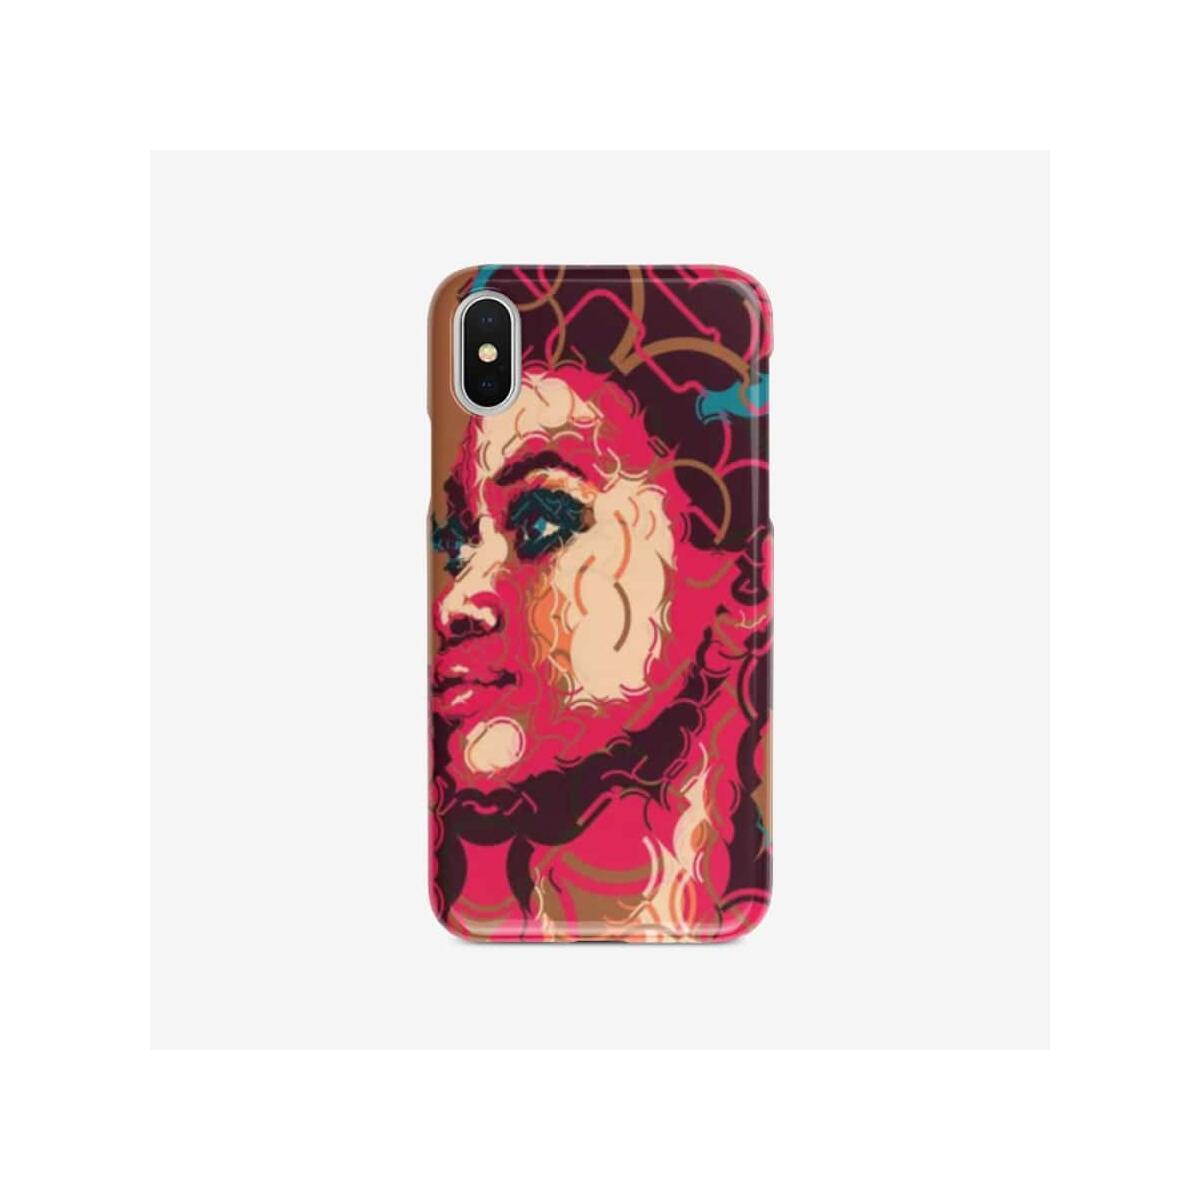 Black Queen iPhone case, iPhone SE